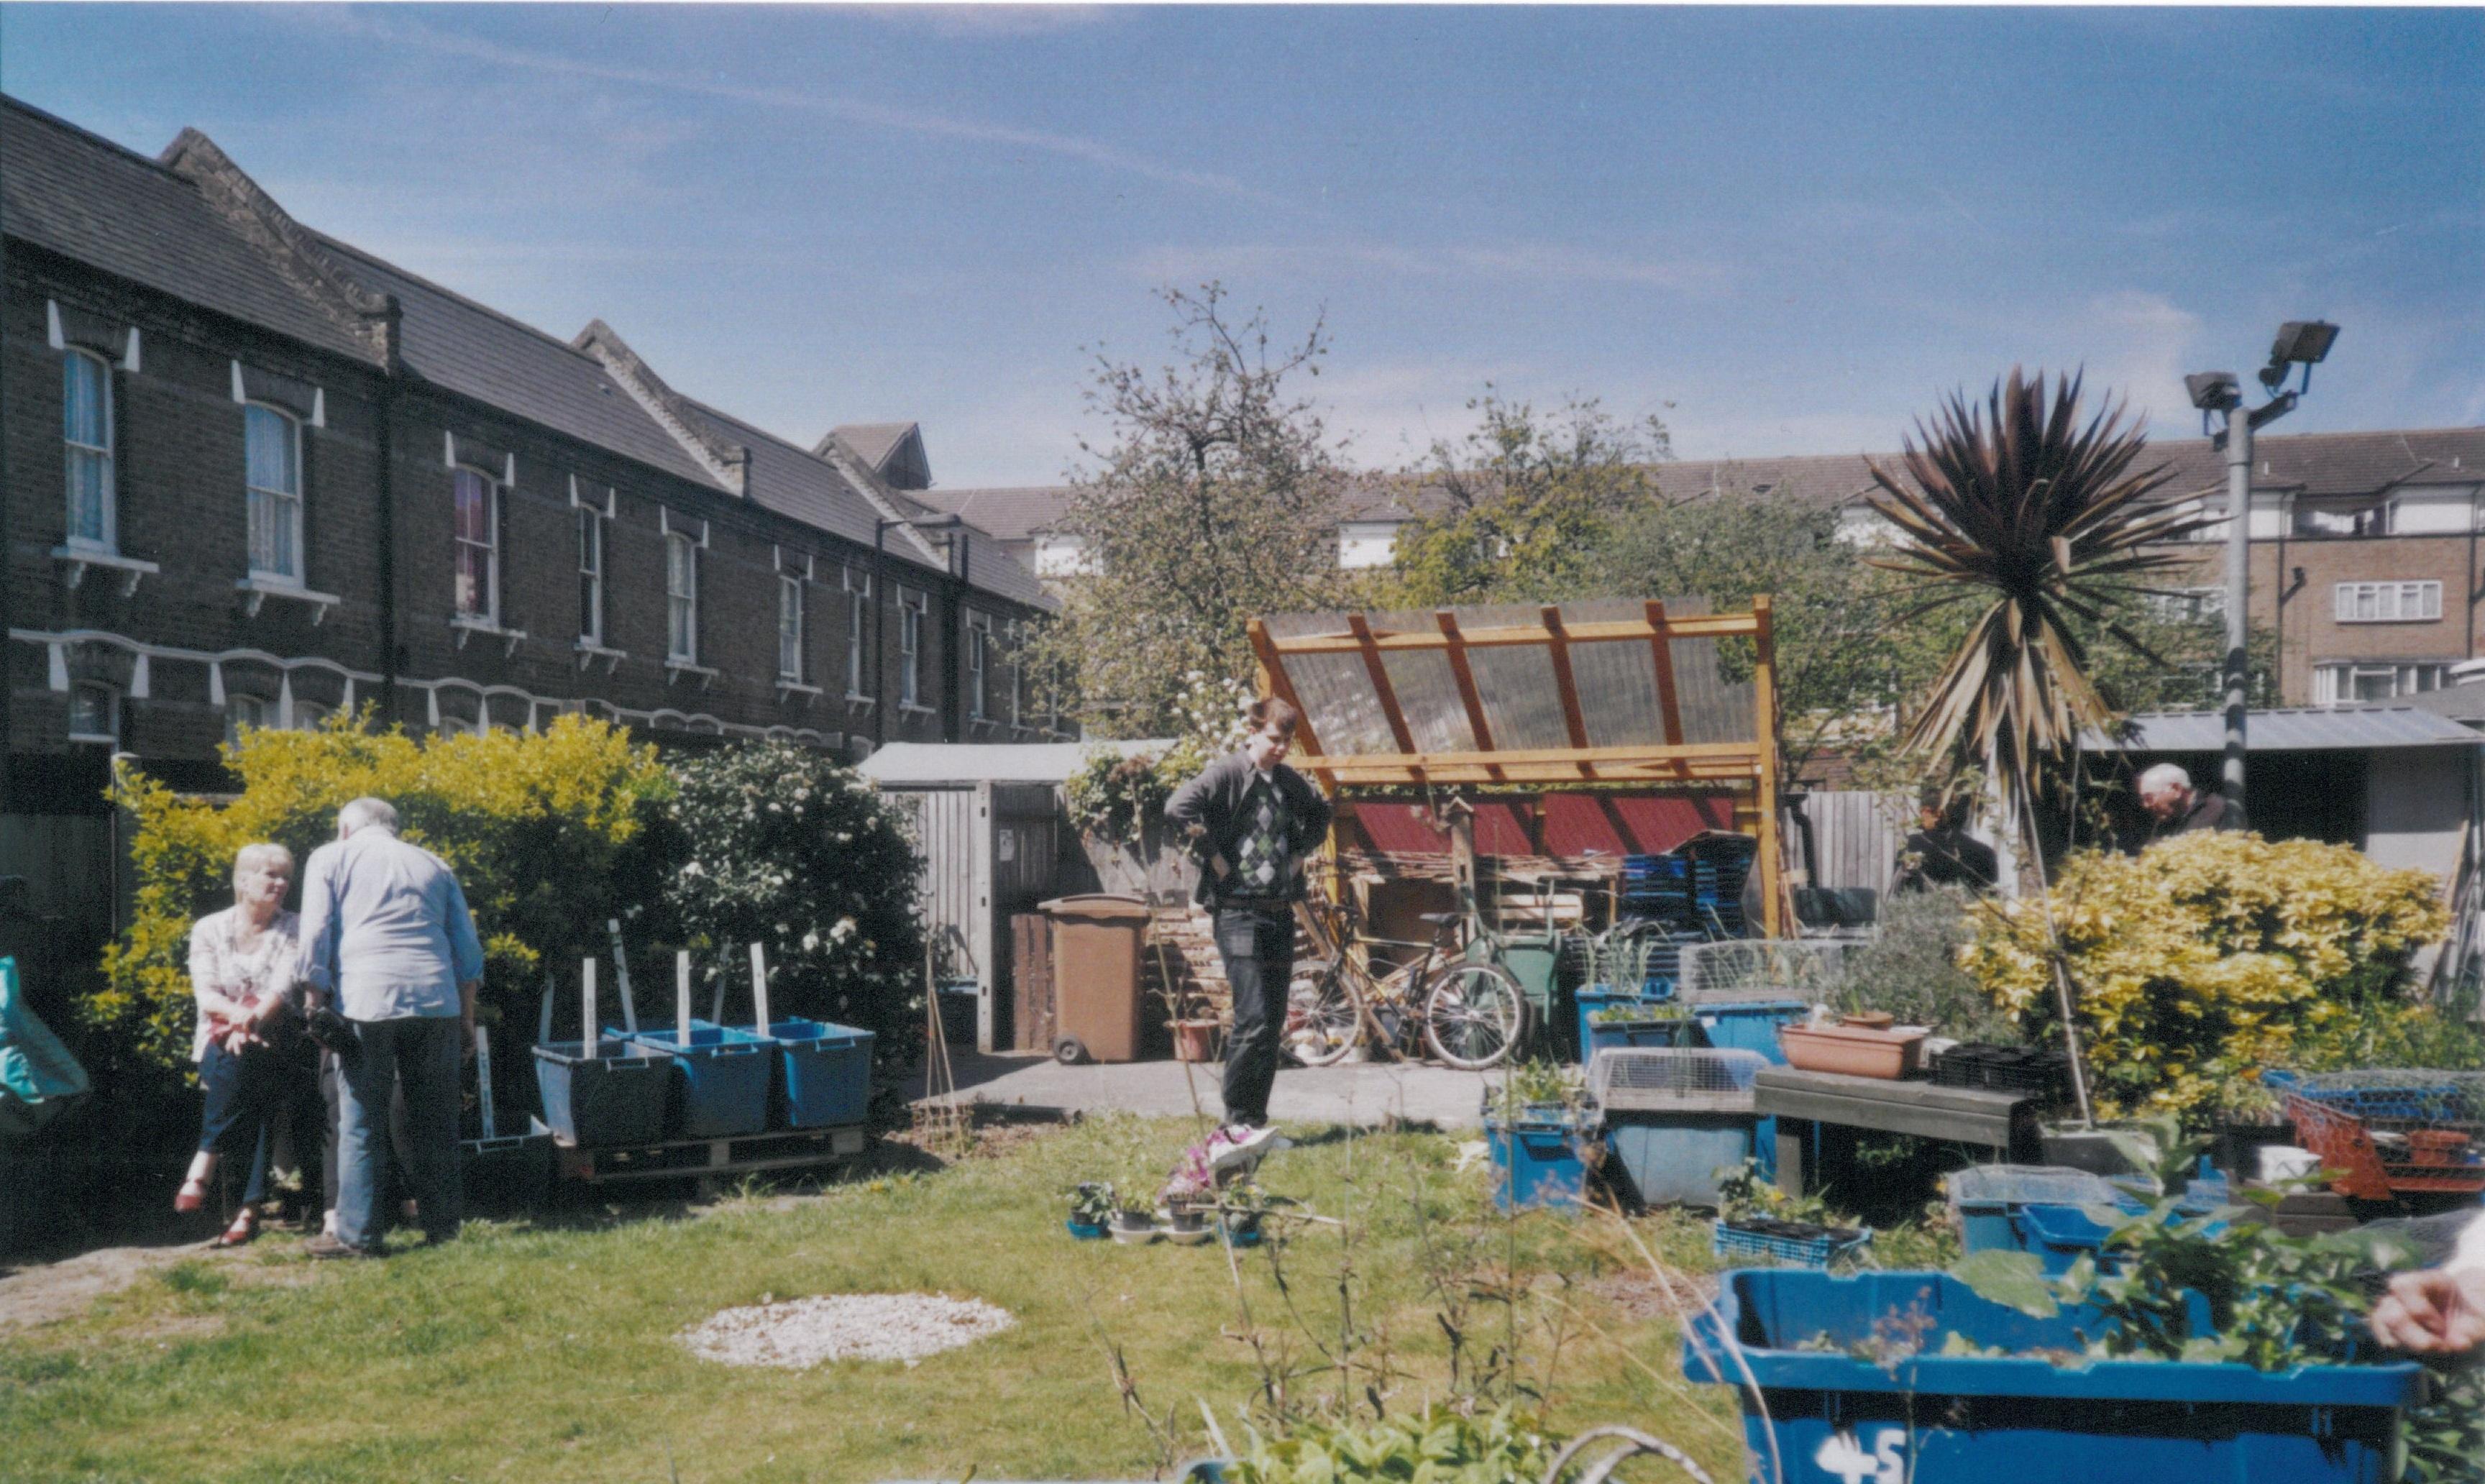 Pembroke House Garden, May 2013